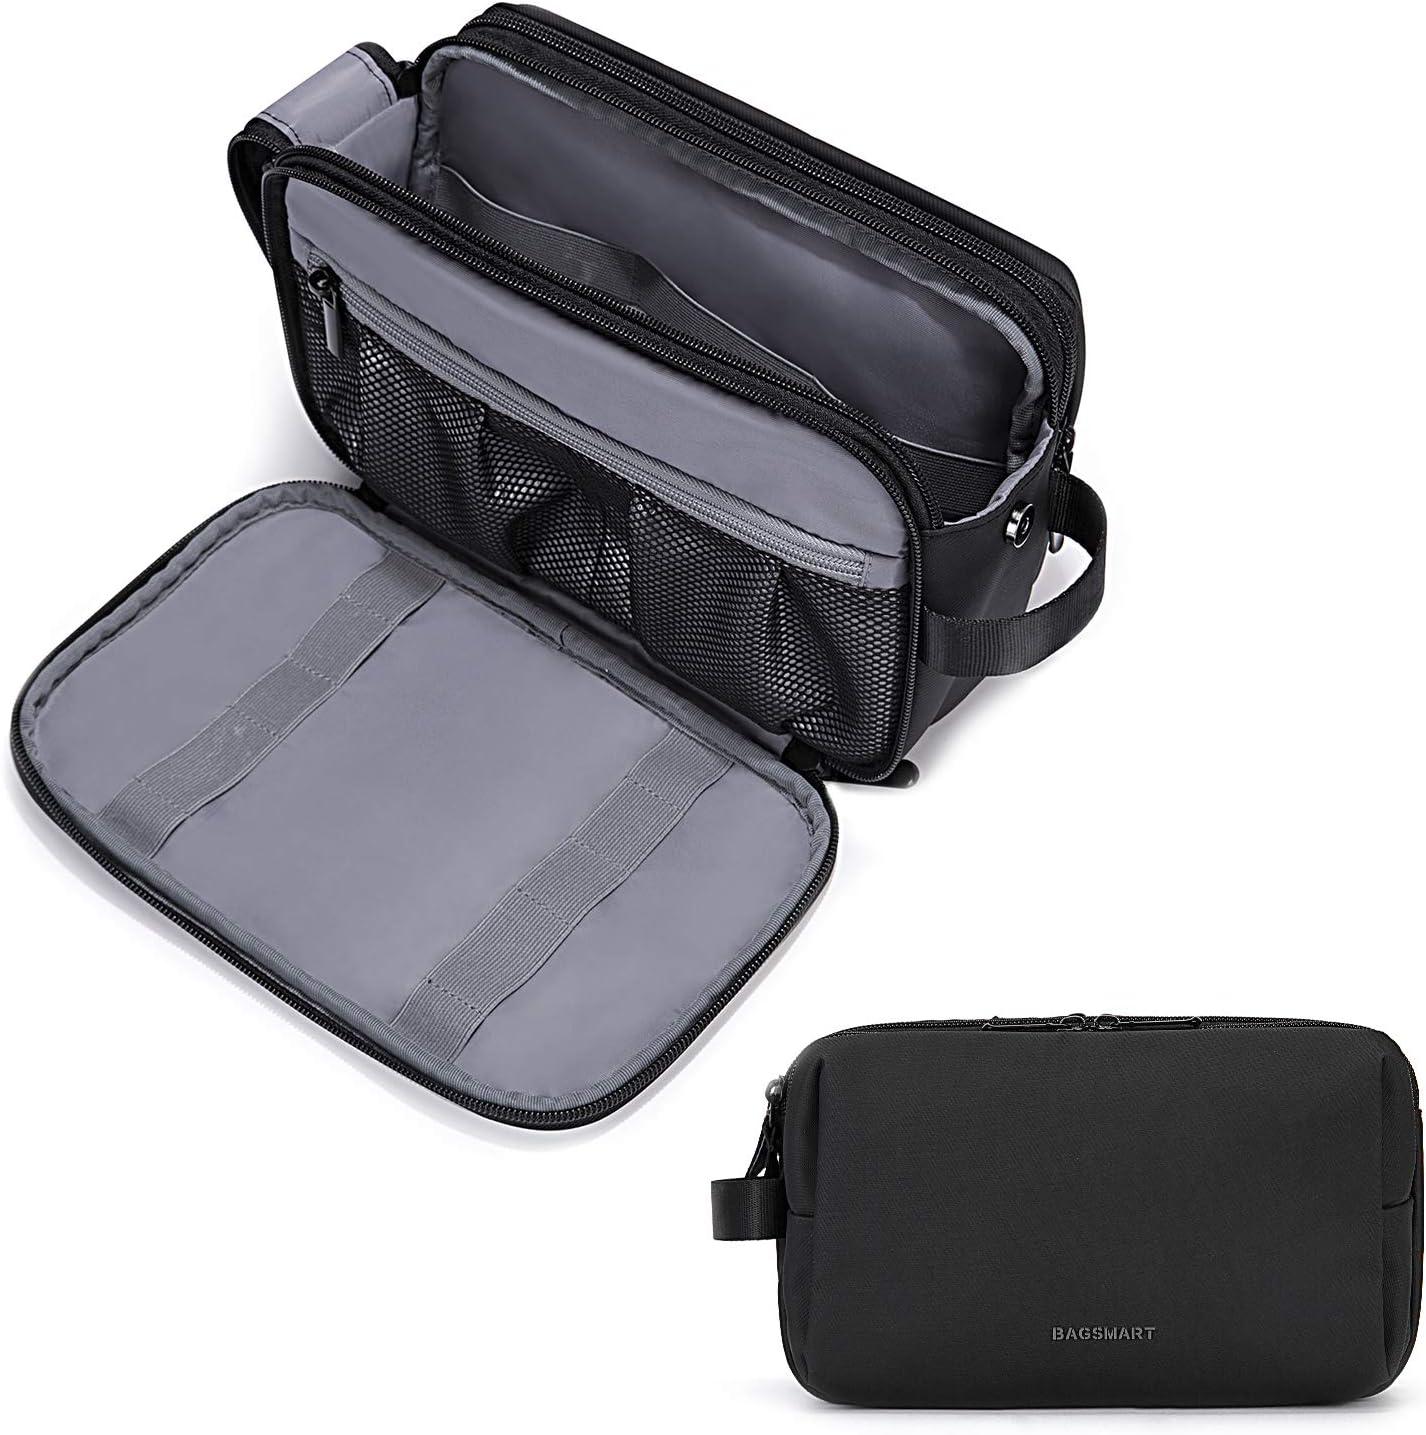 BAGSMART Travel Toiletry Organizer Dopp Kit